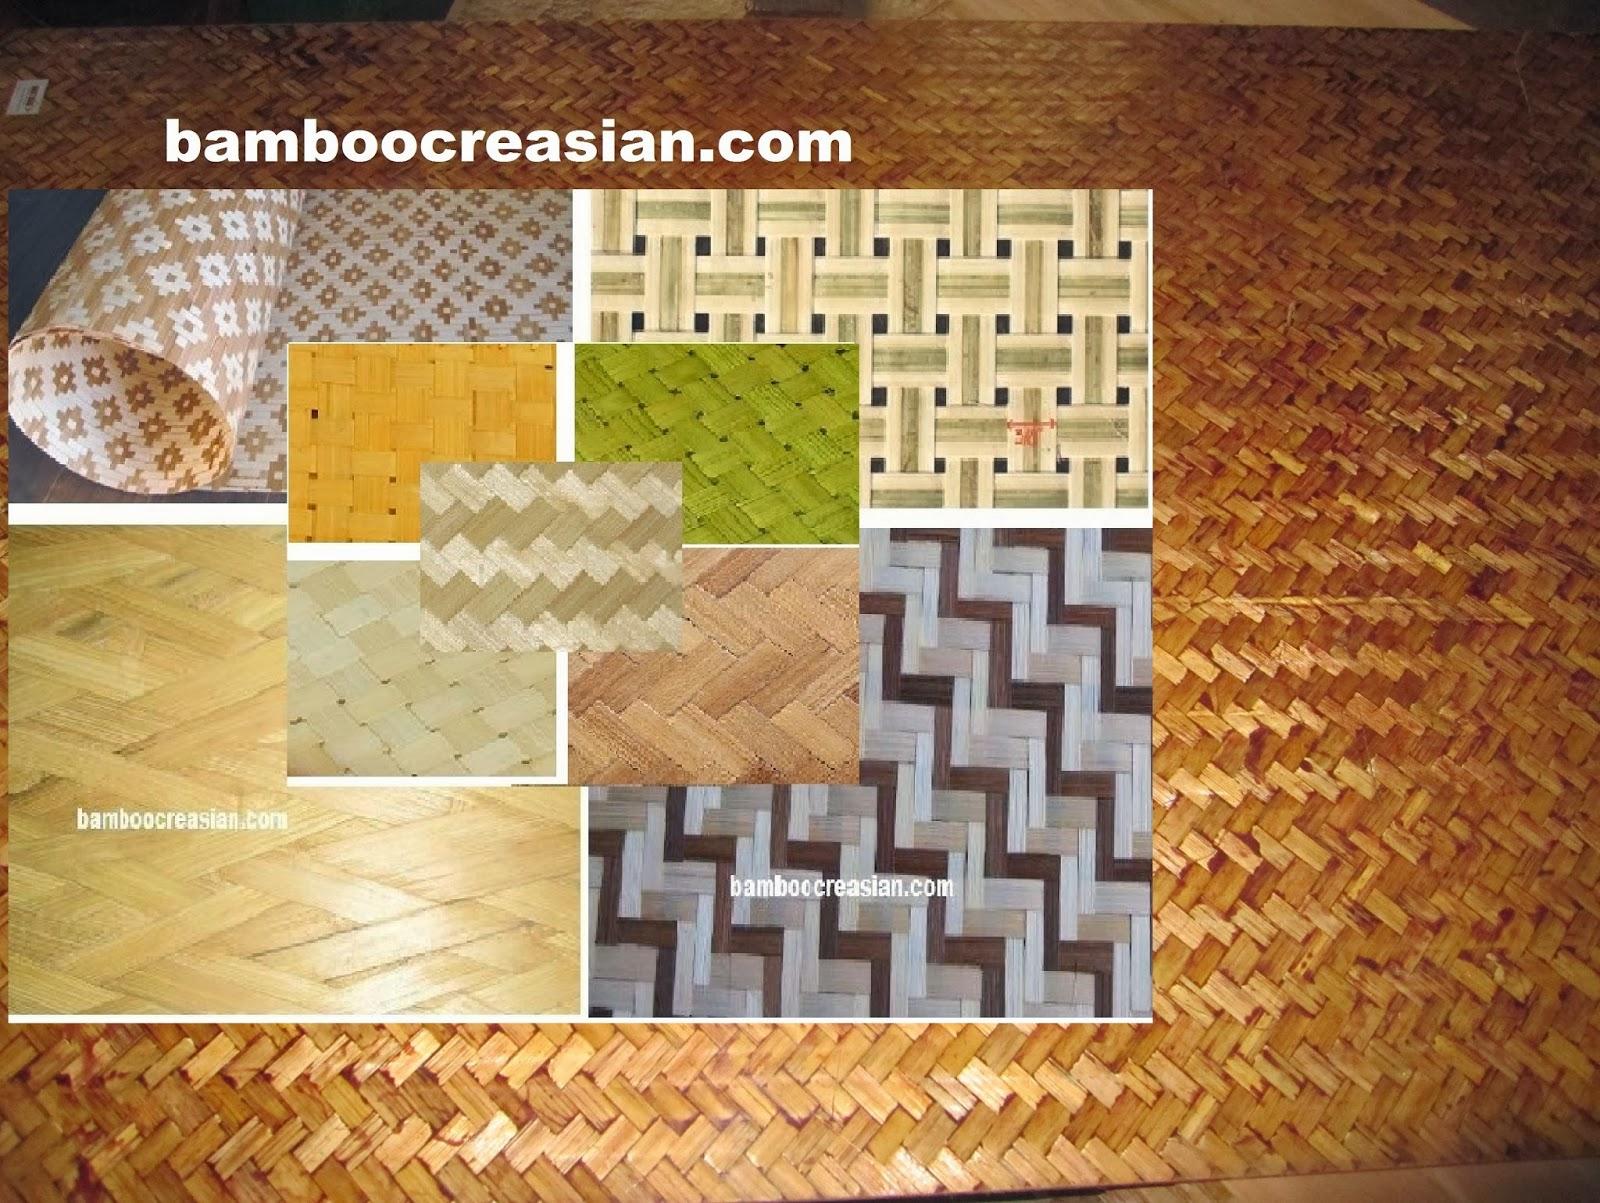 U003d#Bamboo Wall Covering,Natural,u0026 Tropical Wall Covering(Covering Walls U0026  Ceiling Covering): Woven Panels, Bamboo Matting, Bamboo Panels, Bamboo Wall  Panels, ...